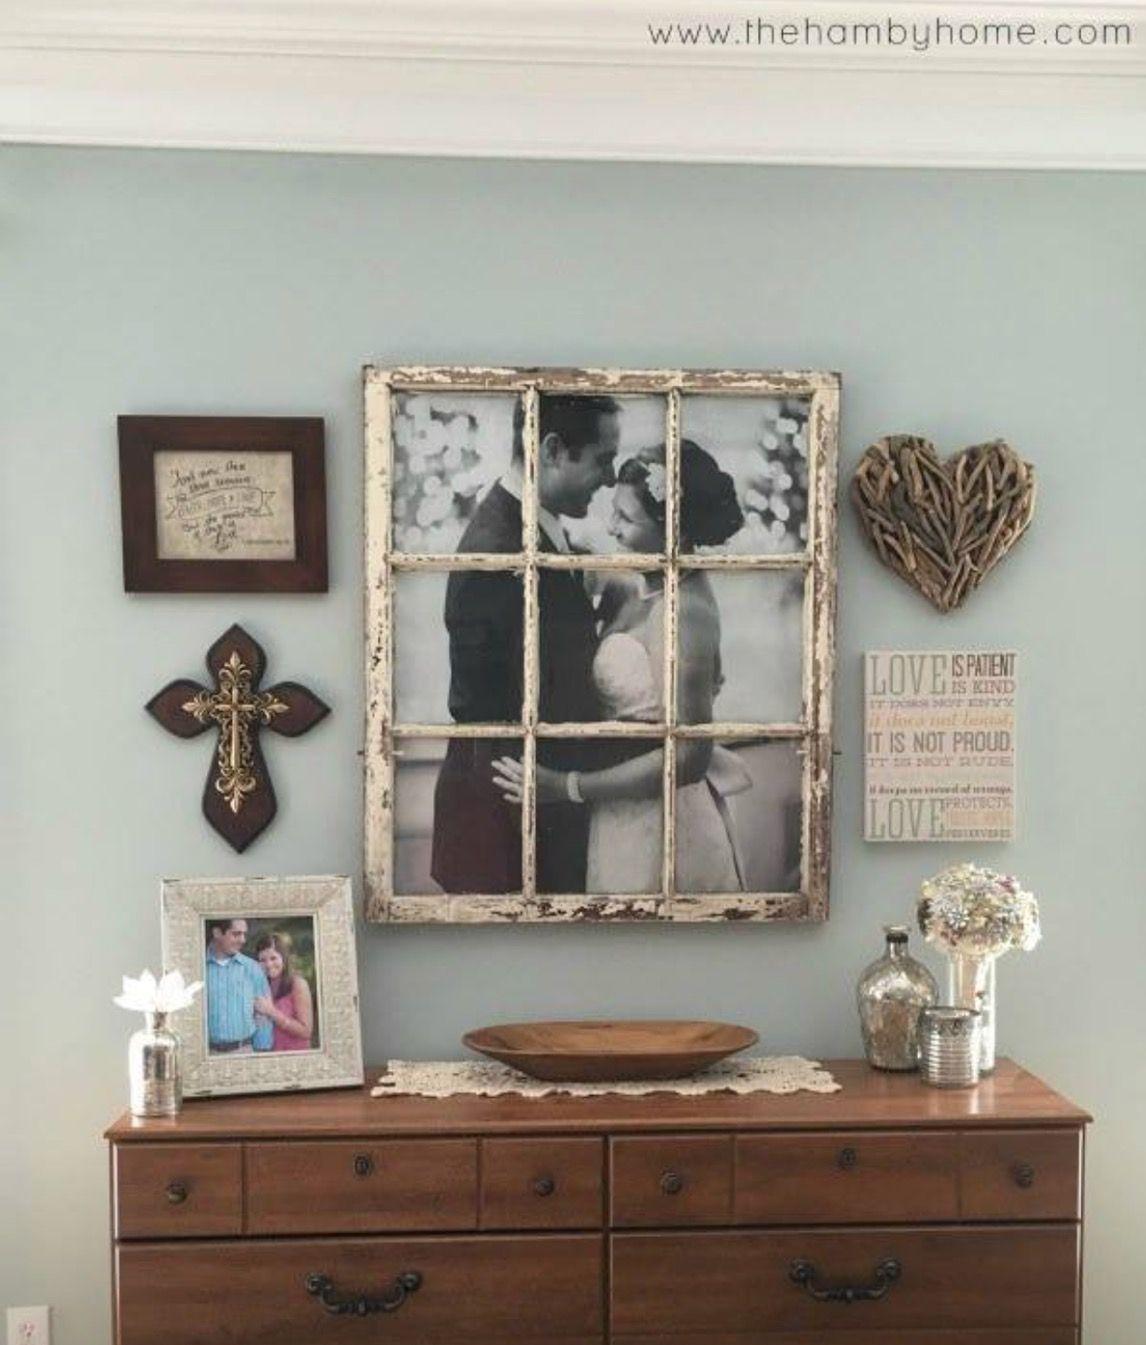 Pin von Whitney Orkies auf Ideas for the Home | Pinterest